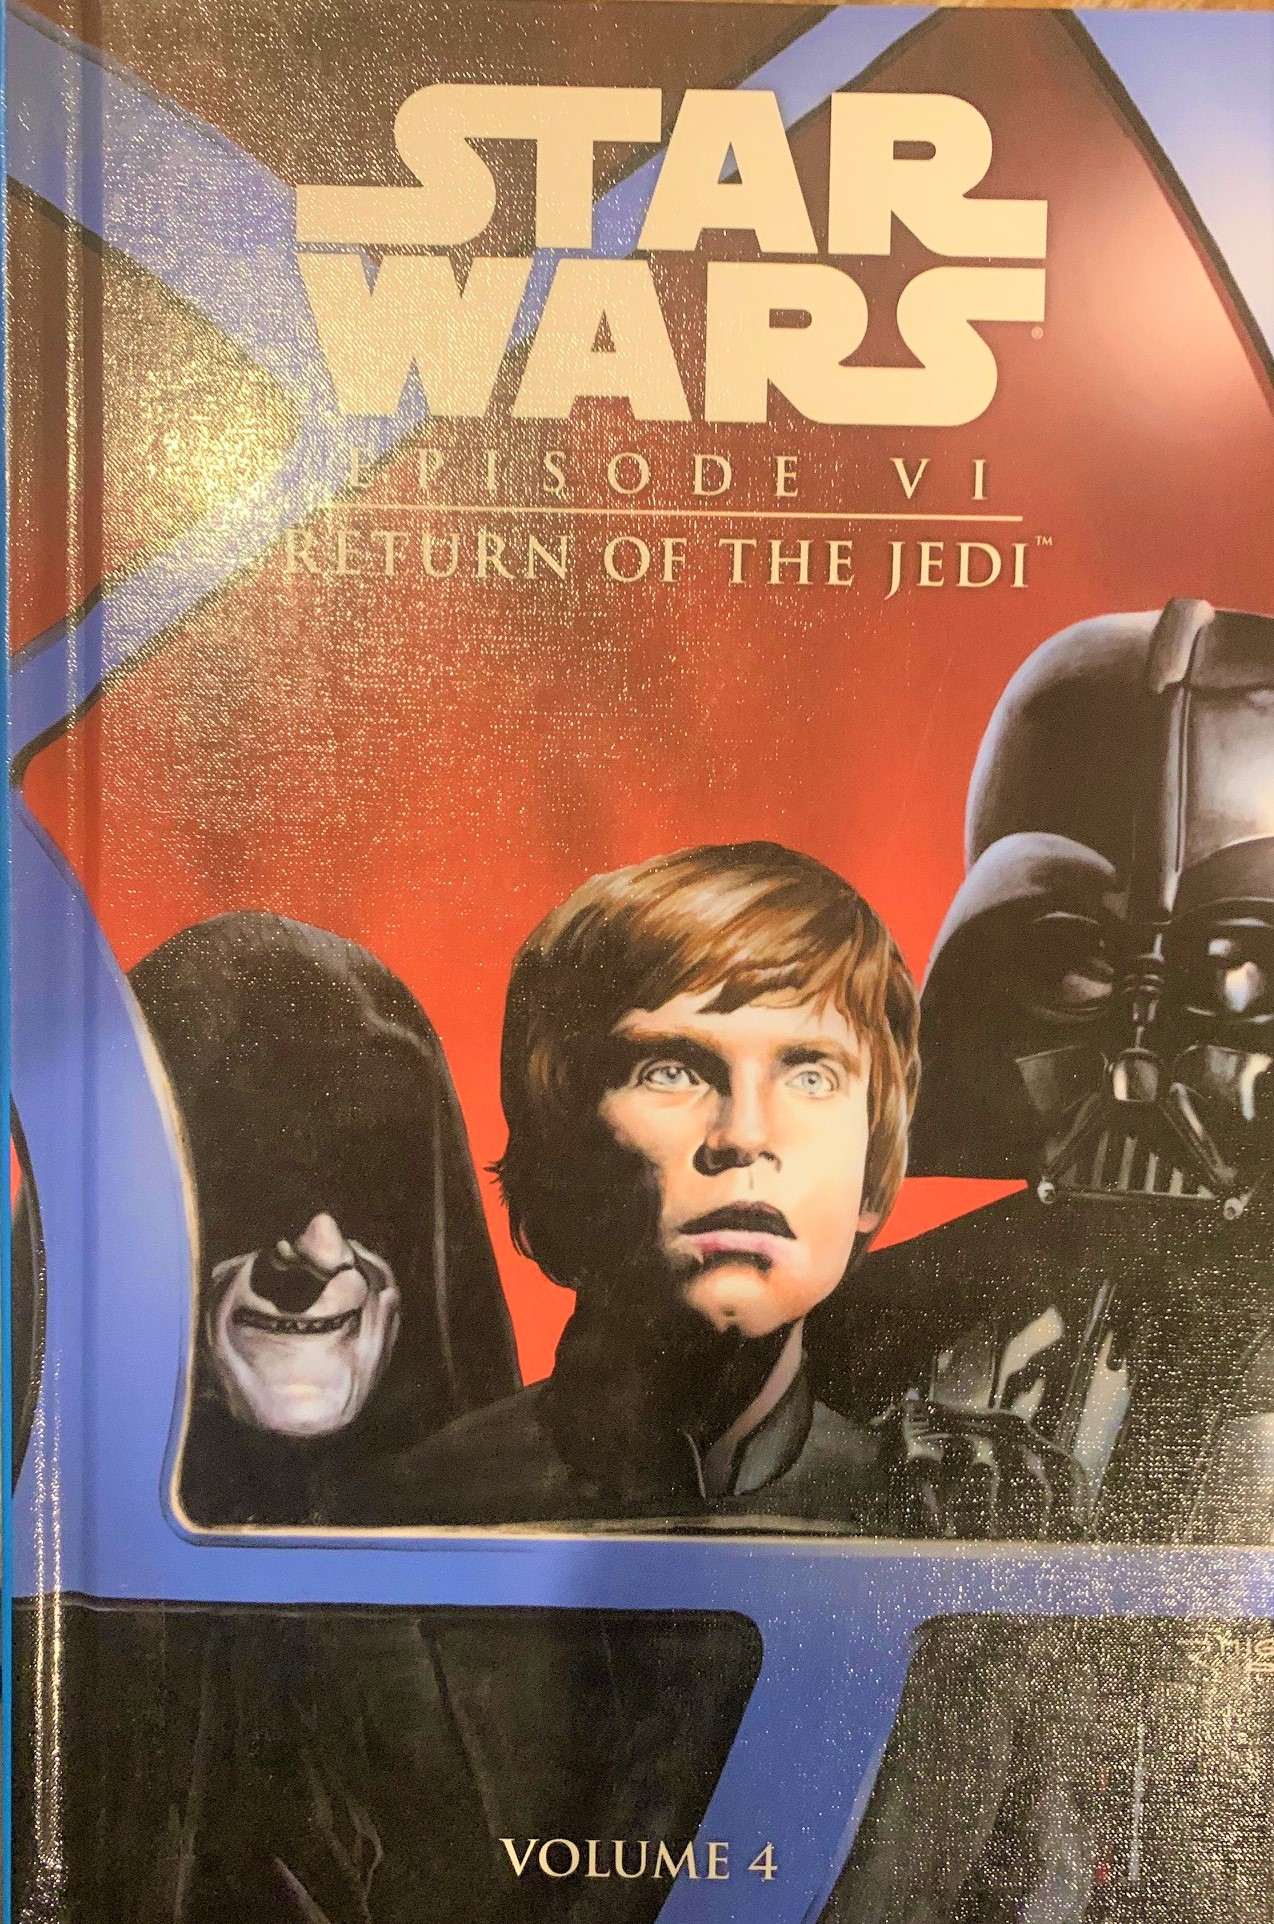 Star Wars Episode VI: Return of the Jedi (Spotlight Comic Edition, Volume 4)